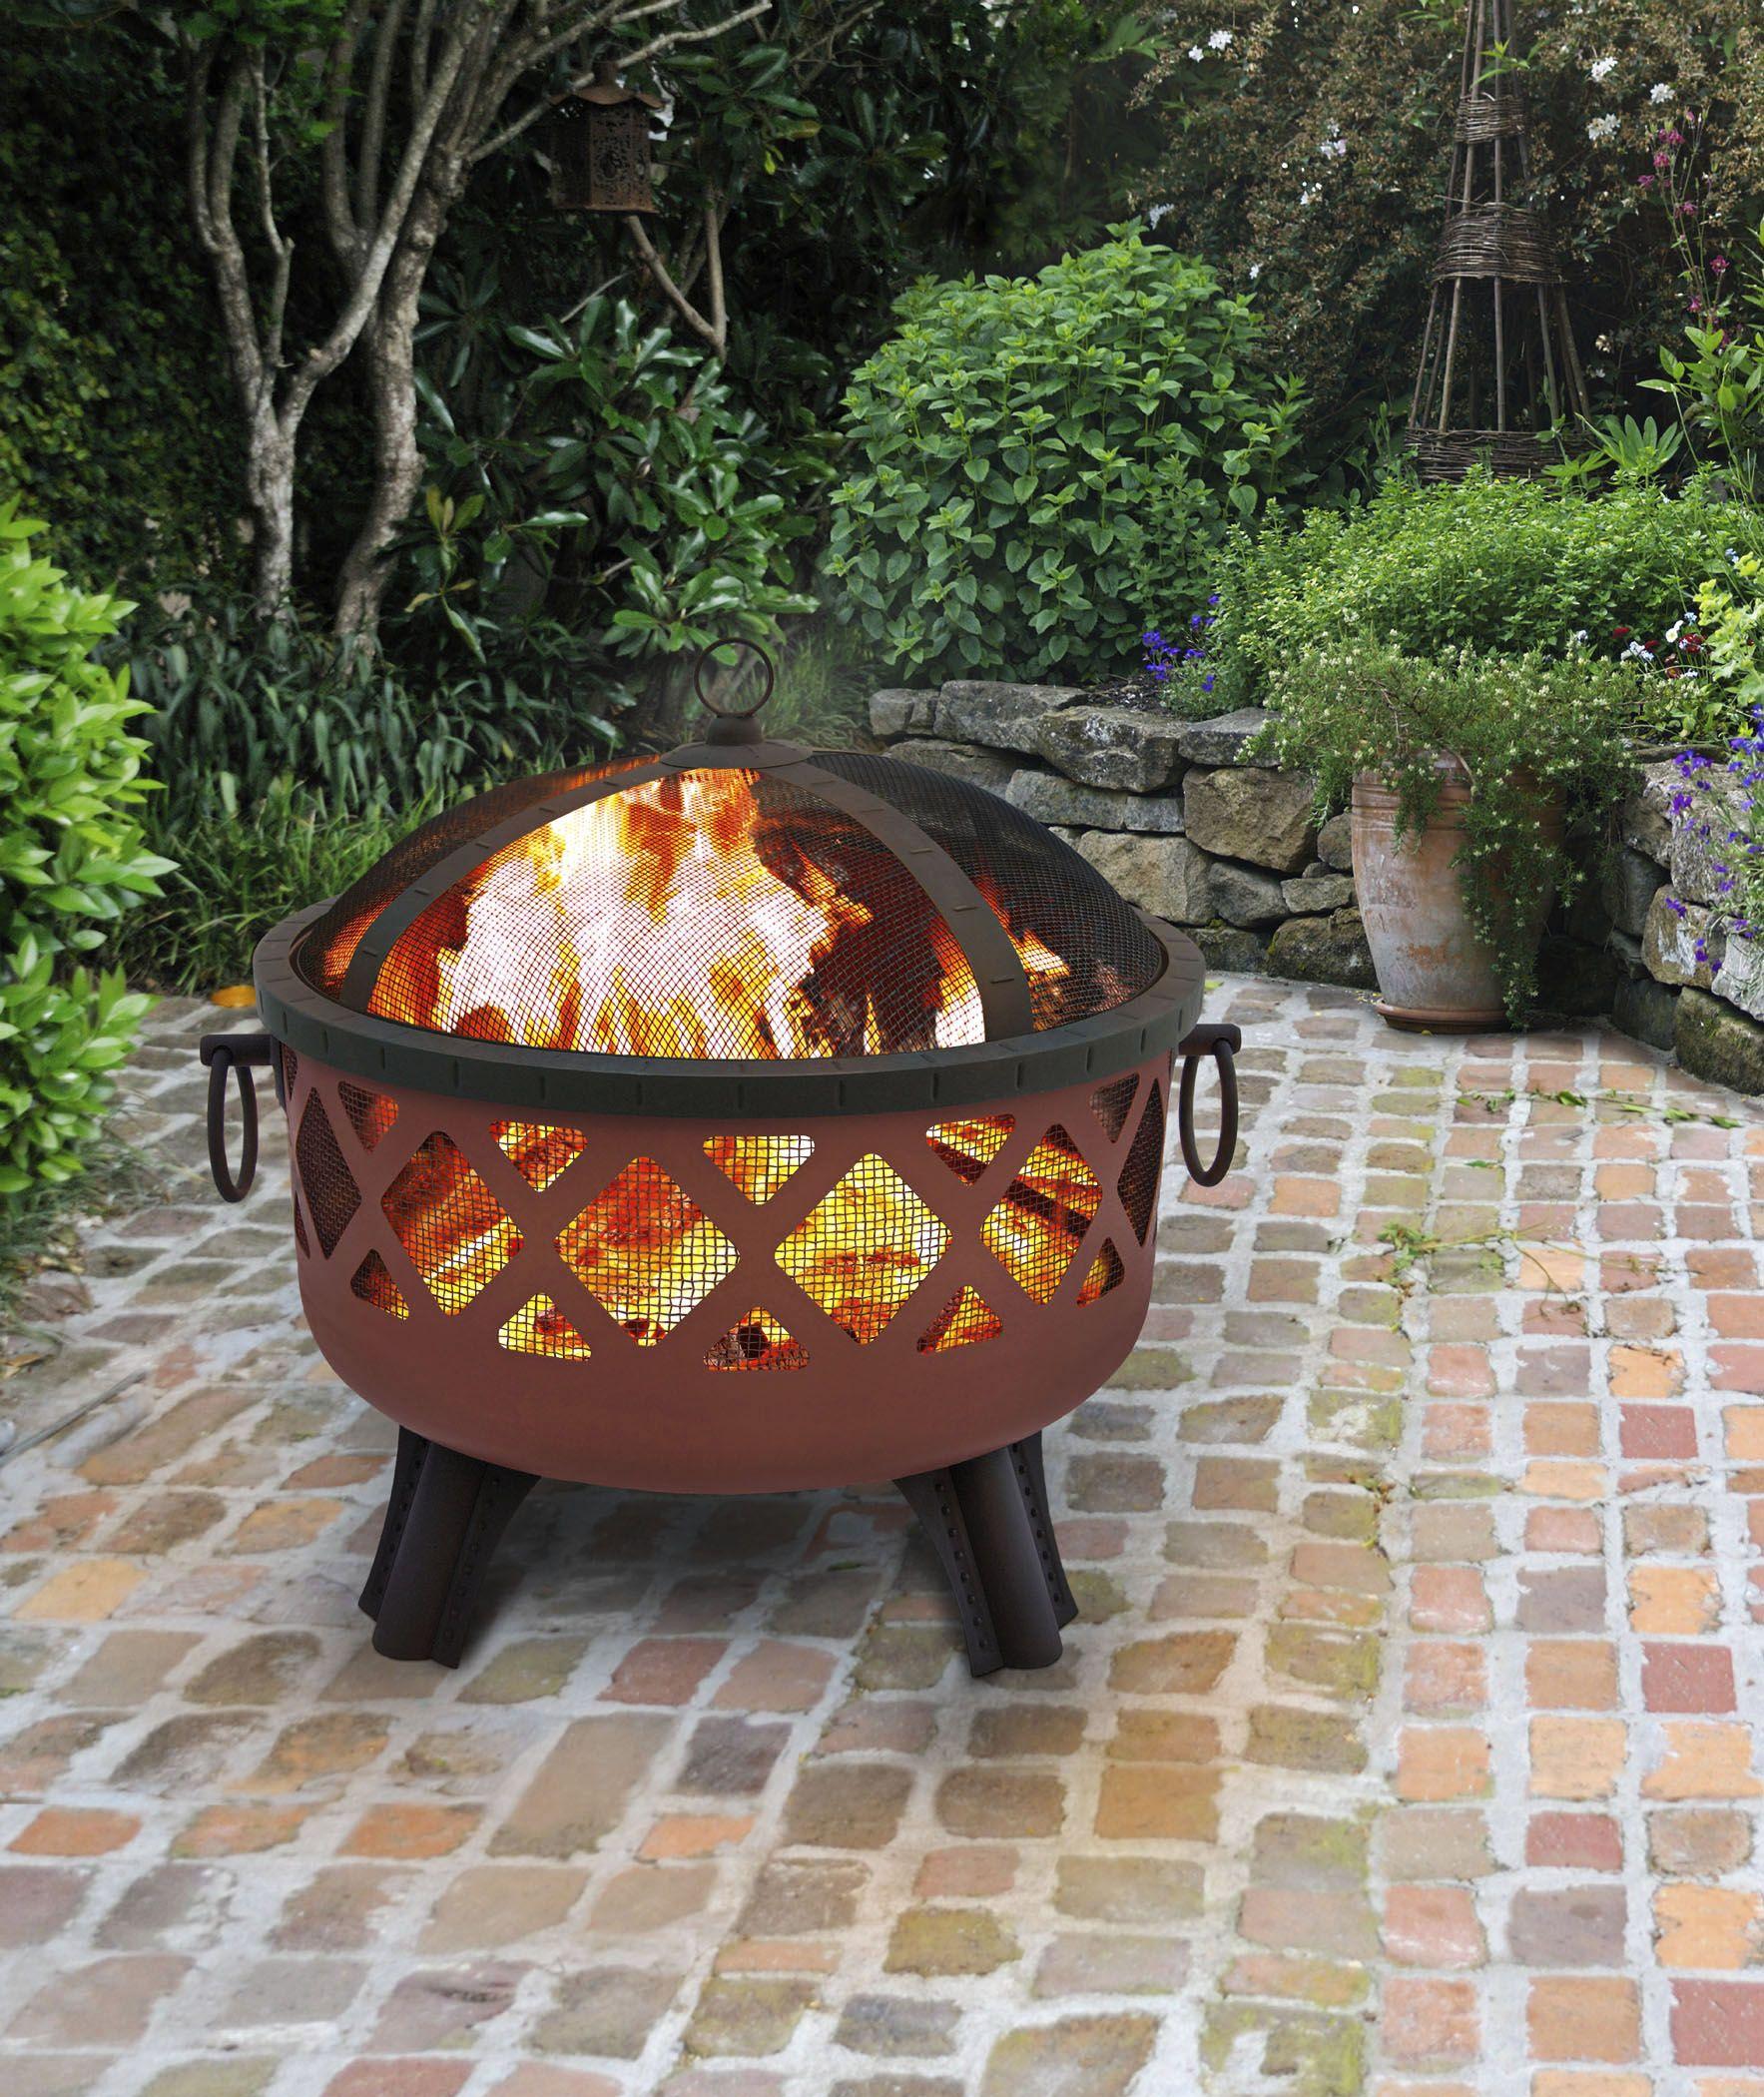 Heavy Duty Folding Fire Pit Ring | Wood burning fire pit ...